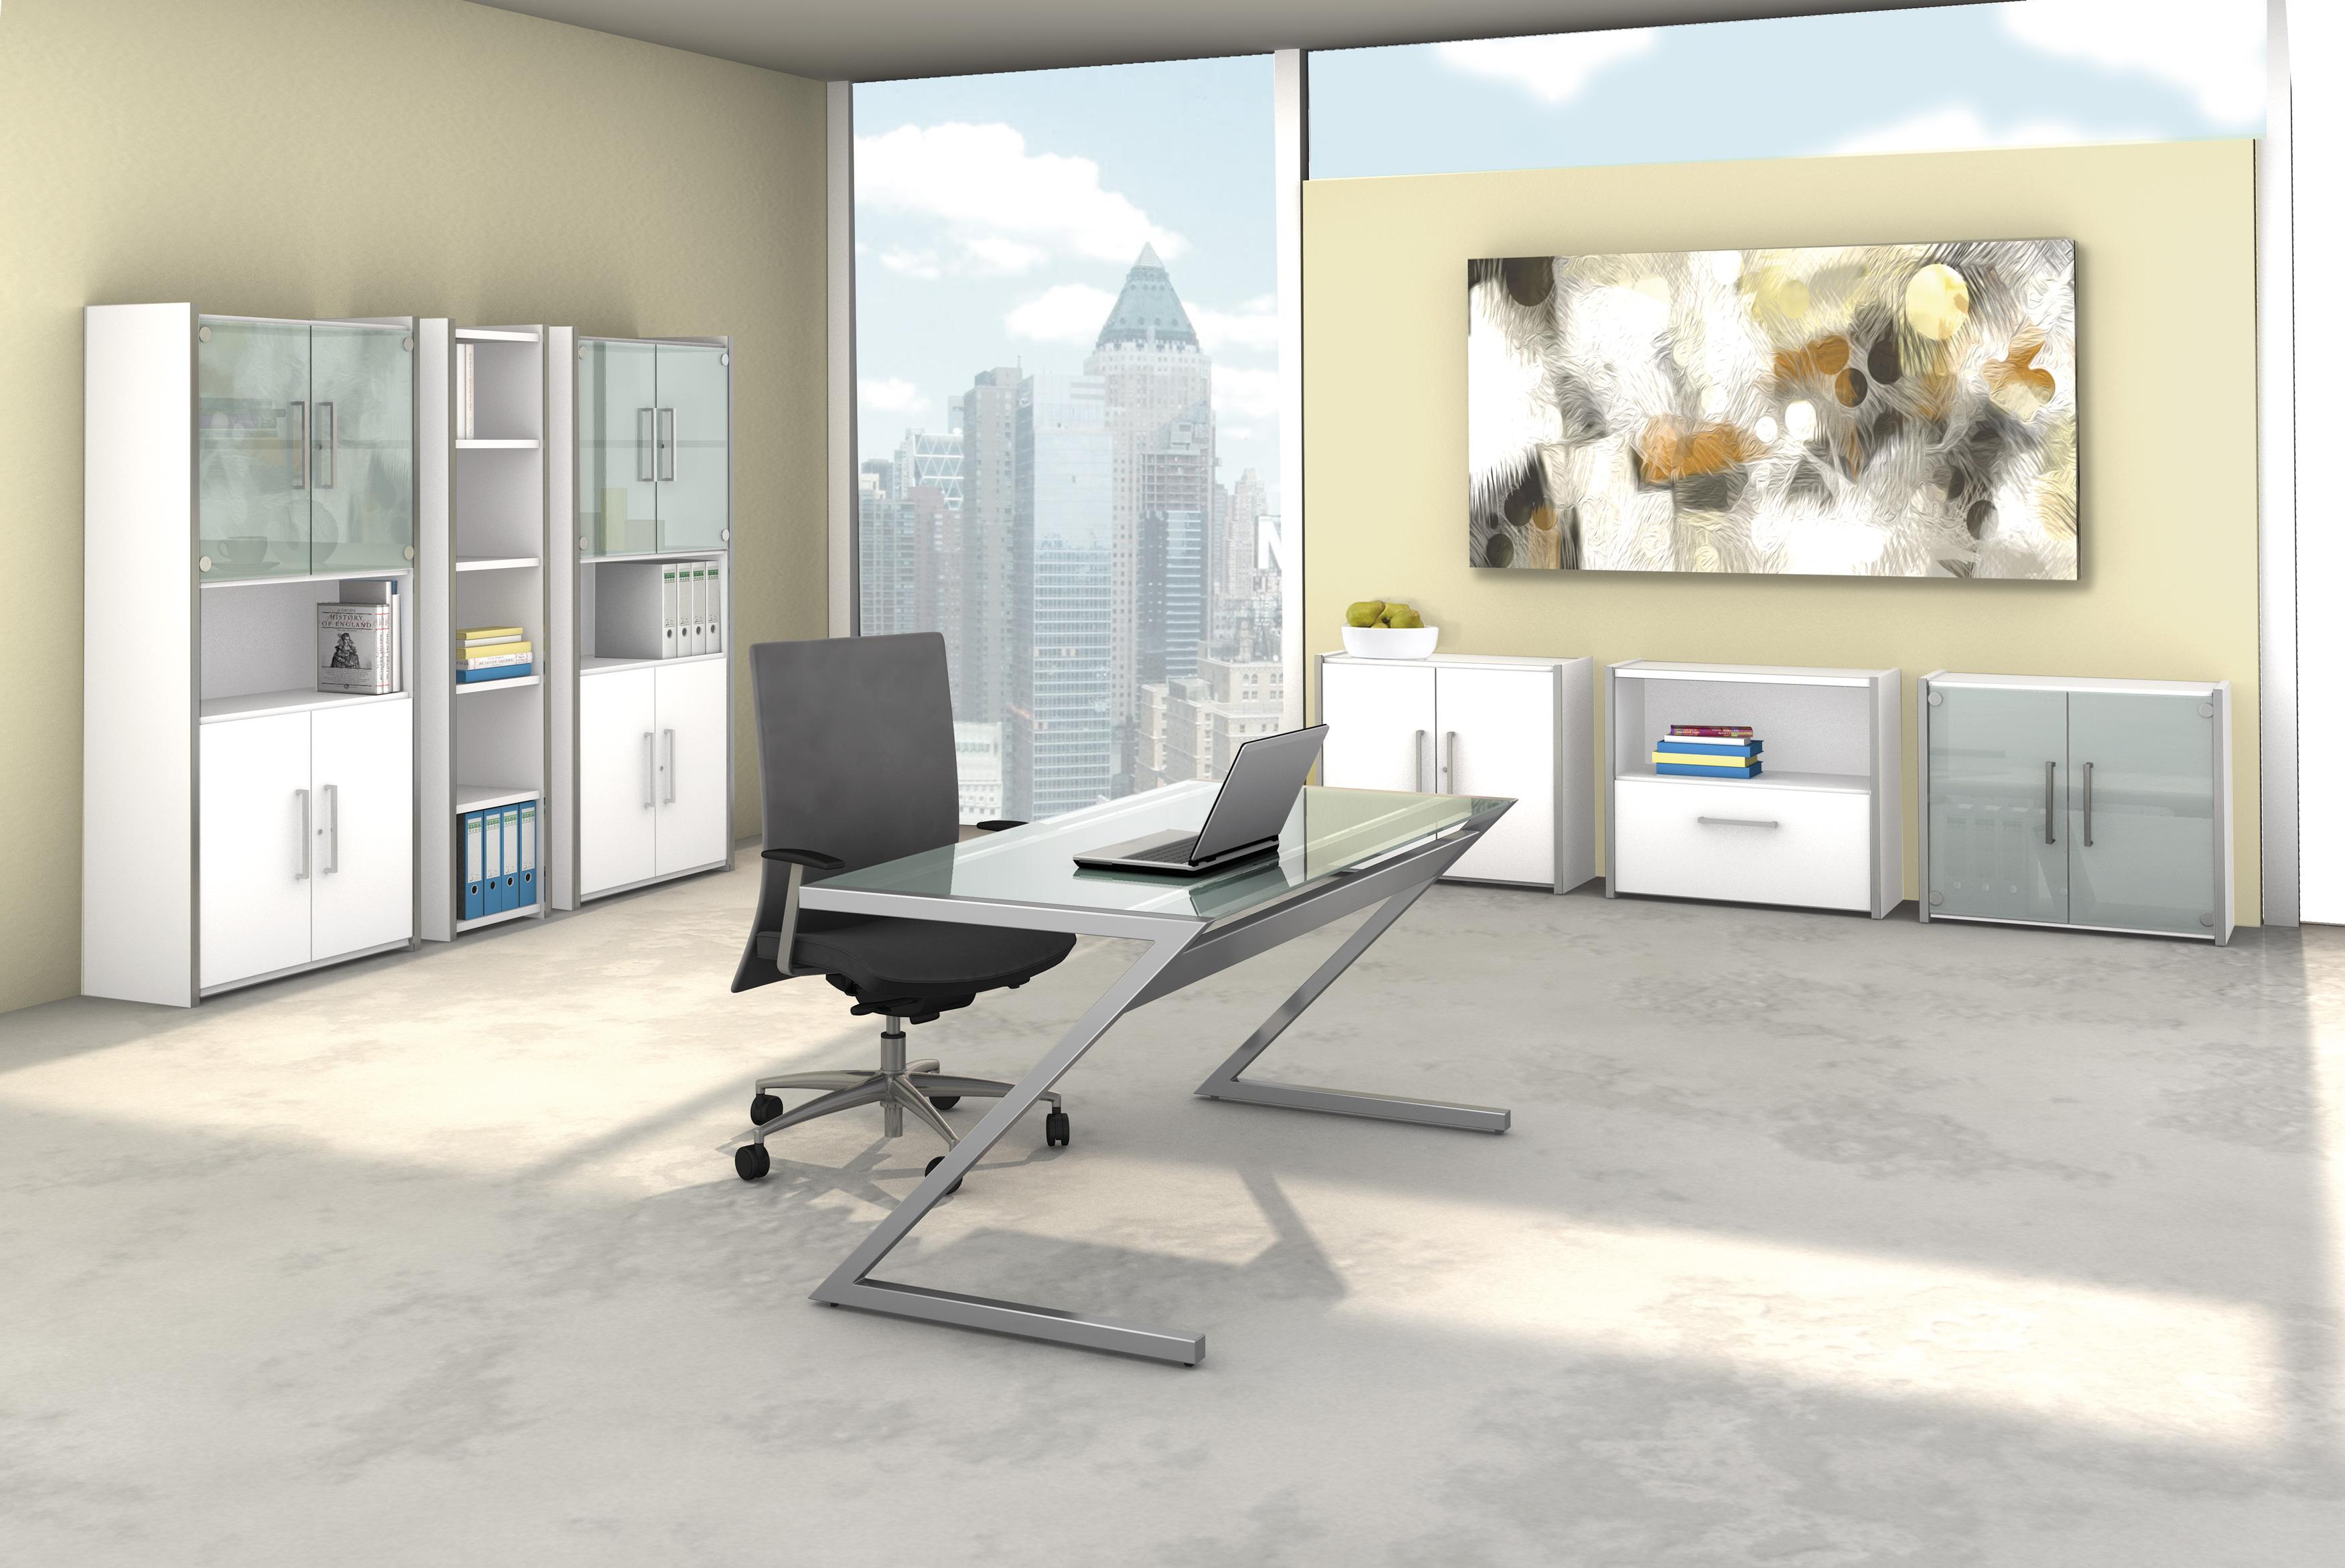 Büromöbel Einrichtung online kaufen | 123 Büromöbel